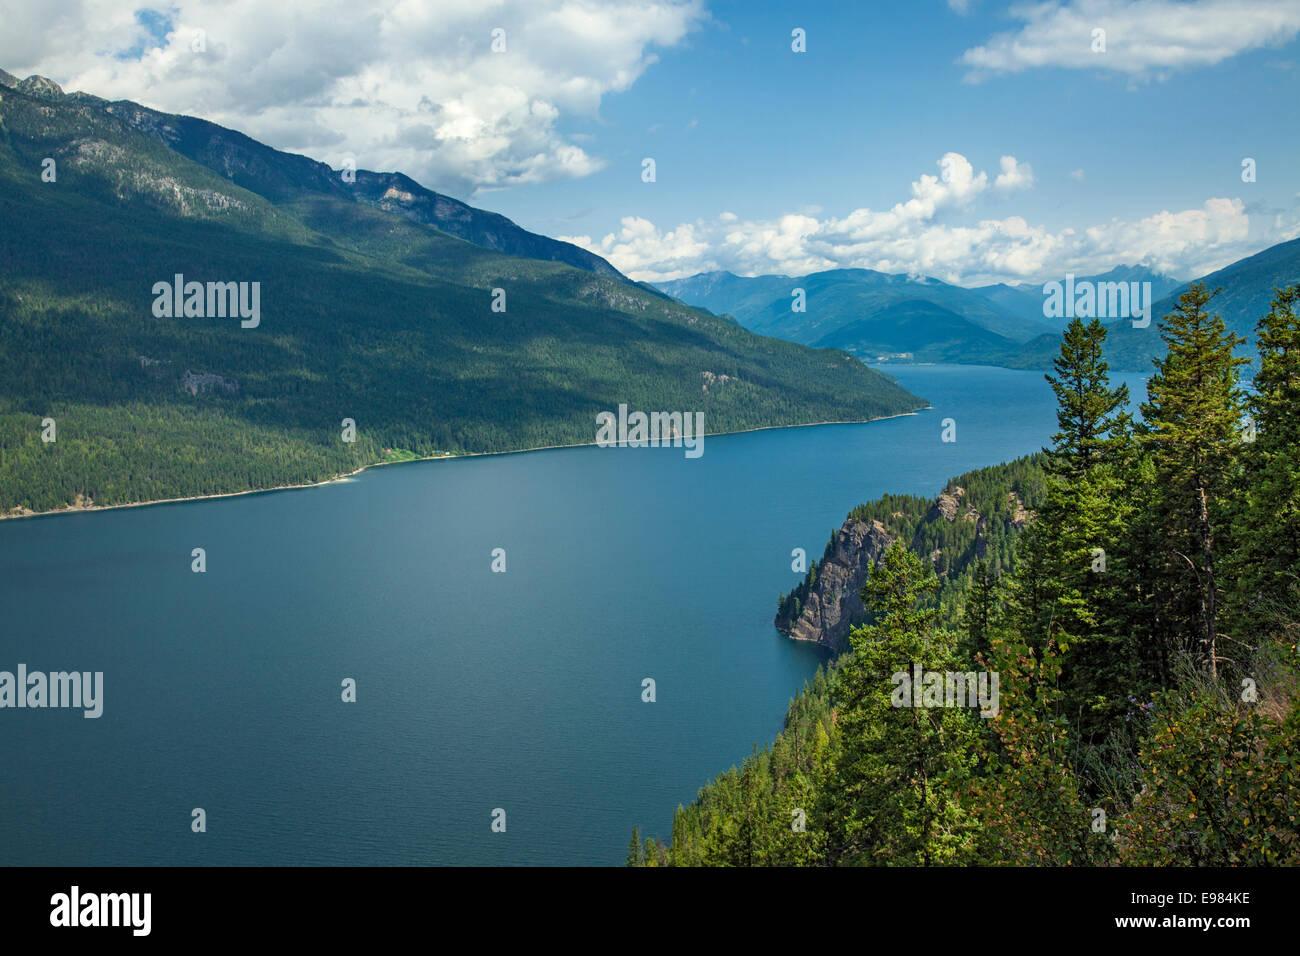 Slocan Lake, Slocan Valley, West Kootenay, British Columbia, Canada - Stock Image